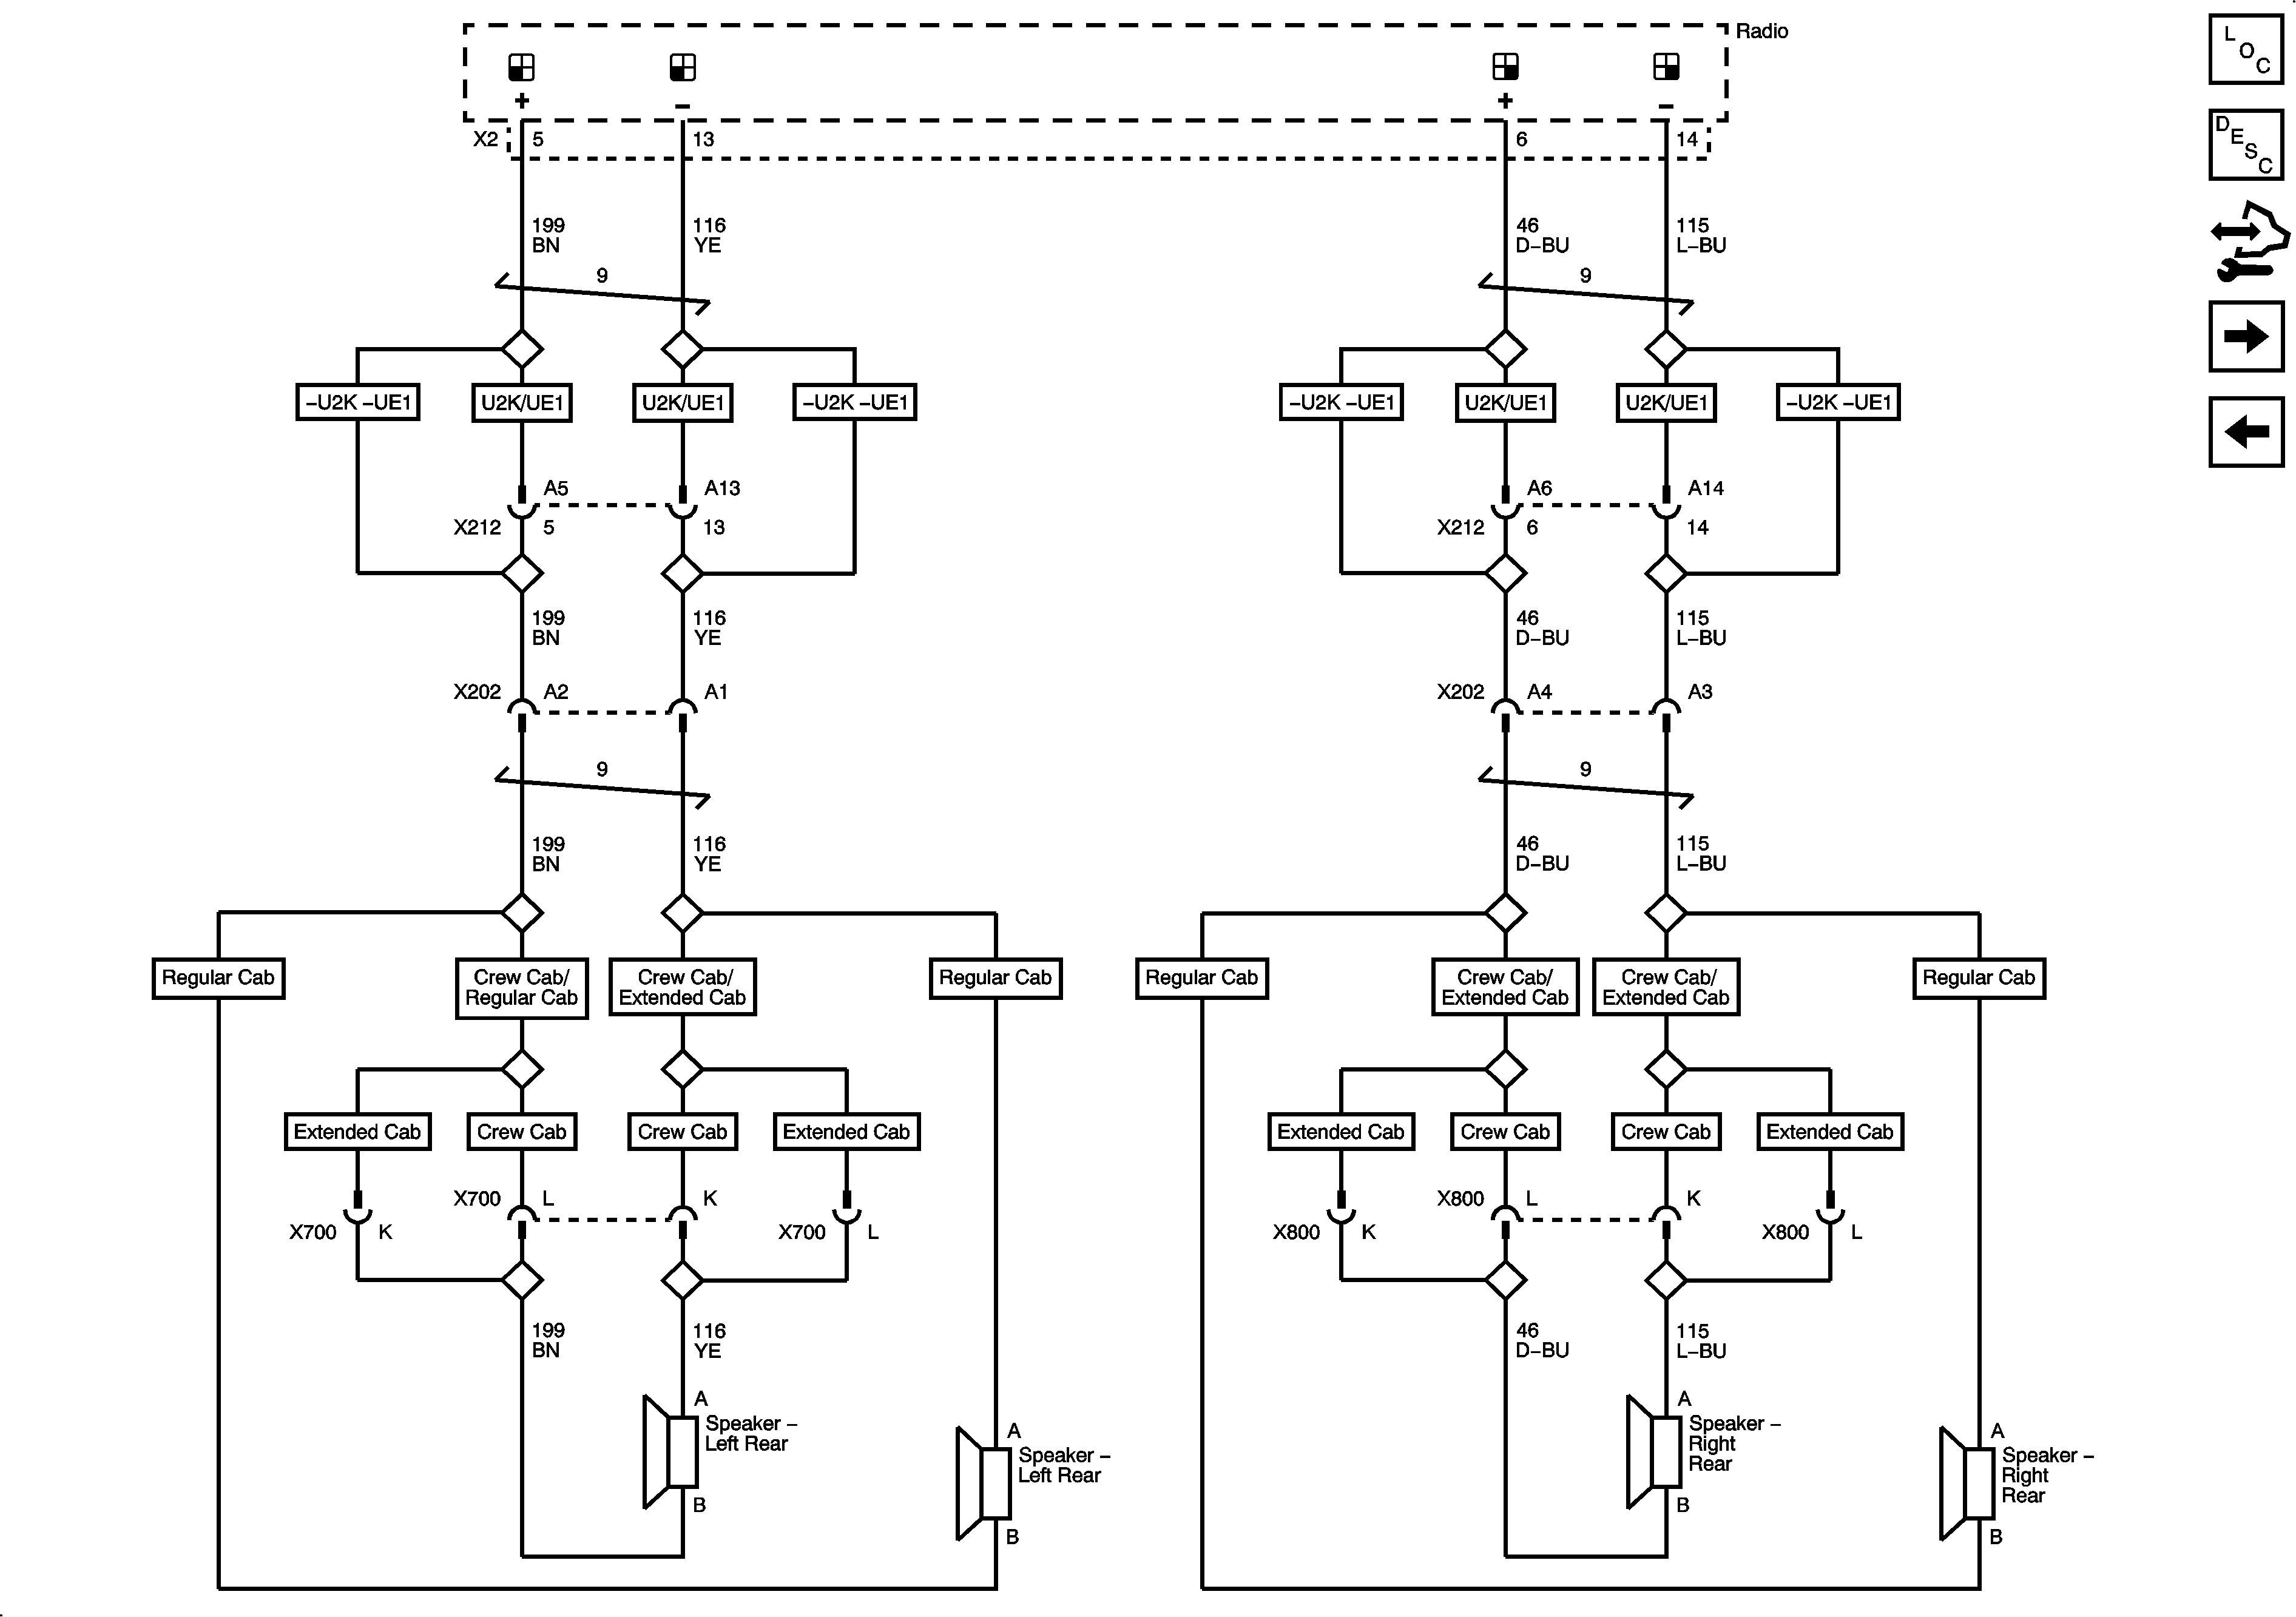 1979 Chevy Truck Radio Wiring Diagram 08 Malibu Electrical Diagram Wiring Diagram Datasource Of 1979 Chevy Truck Radio Wiring Diagram